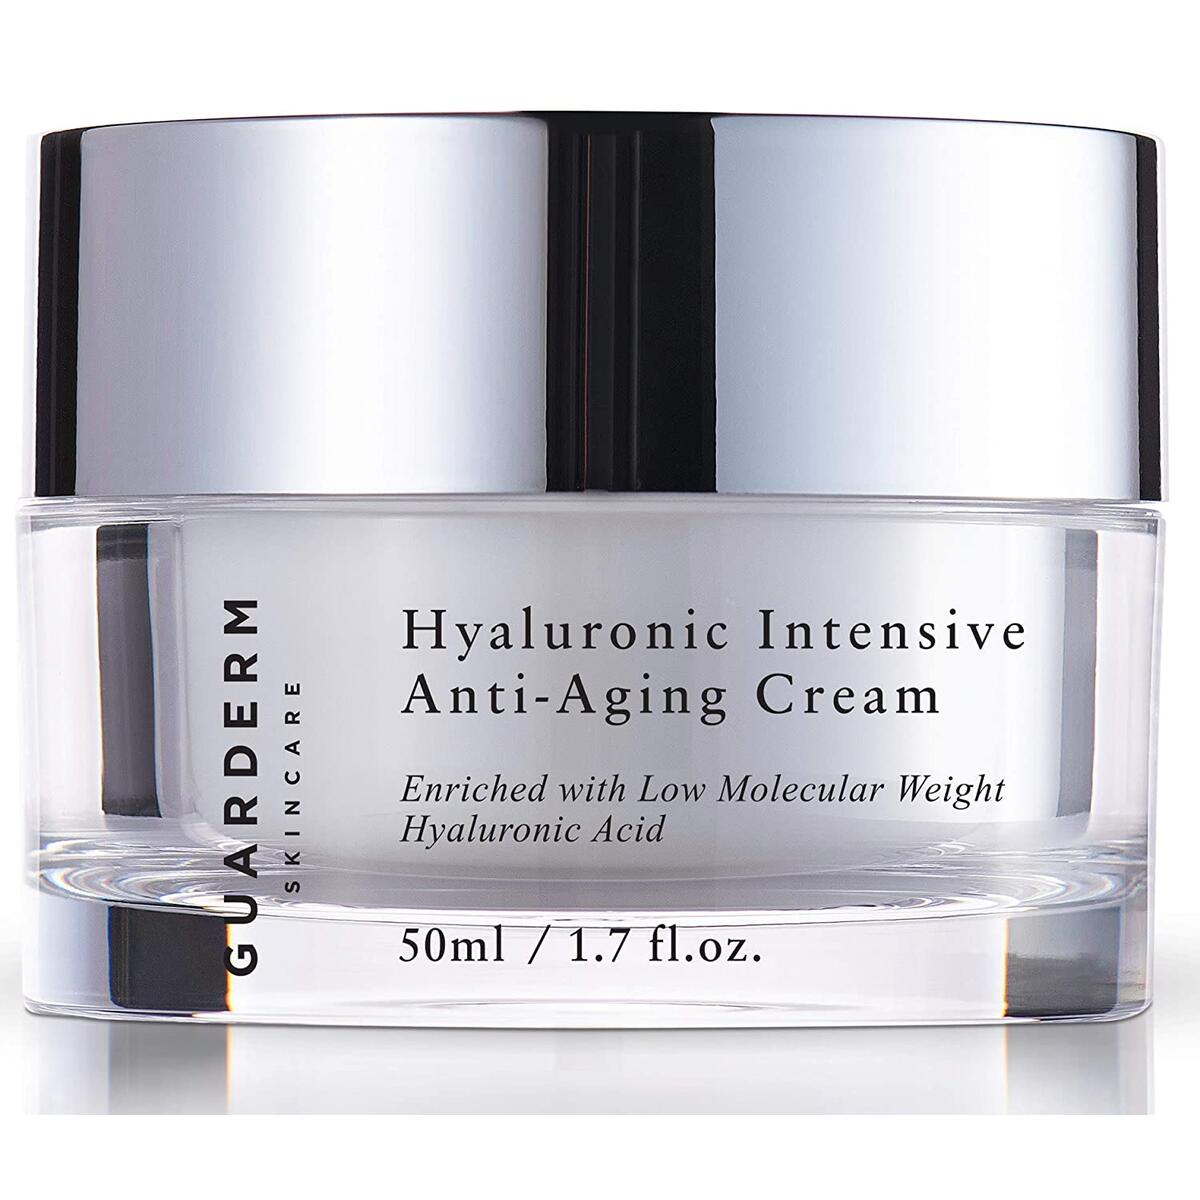 Hyaluronic Intensive Anti-Aging Cream